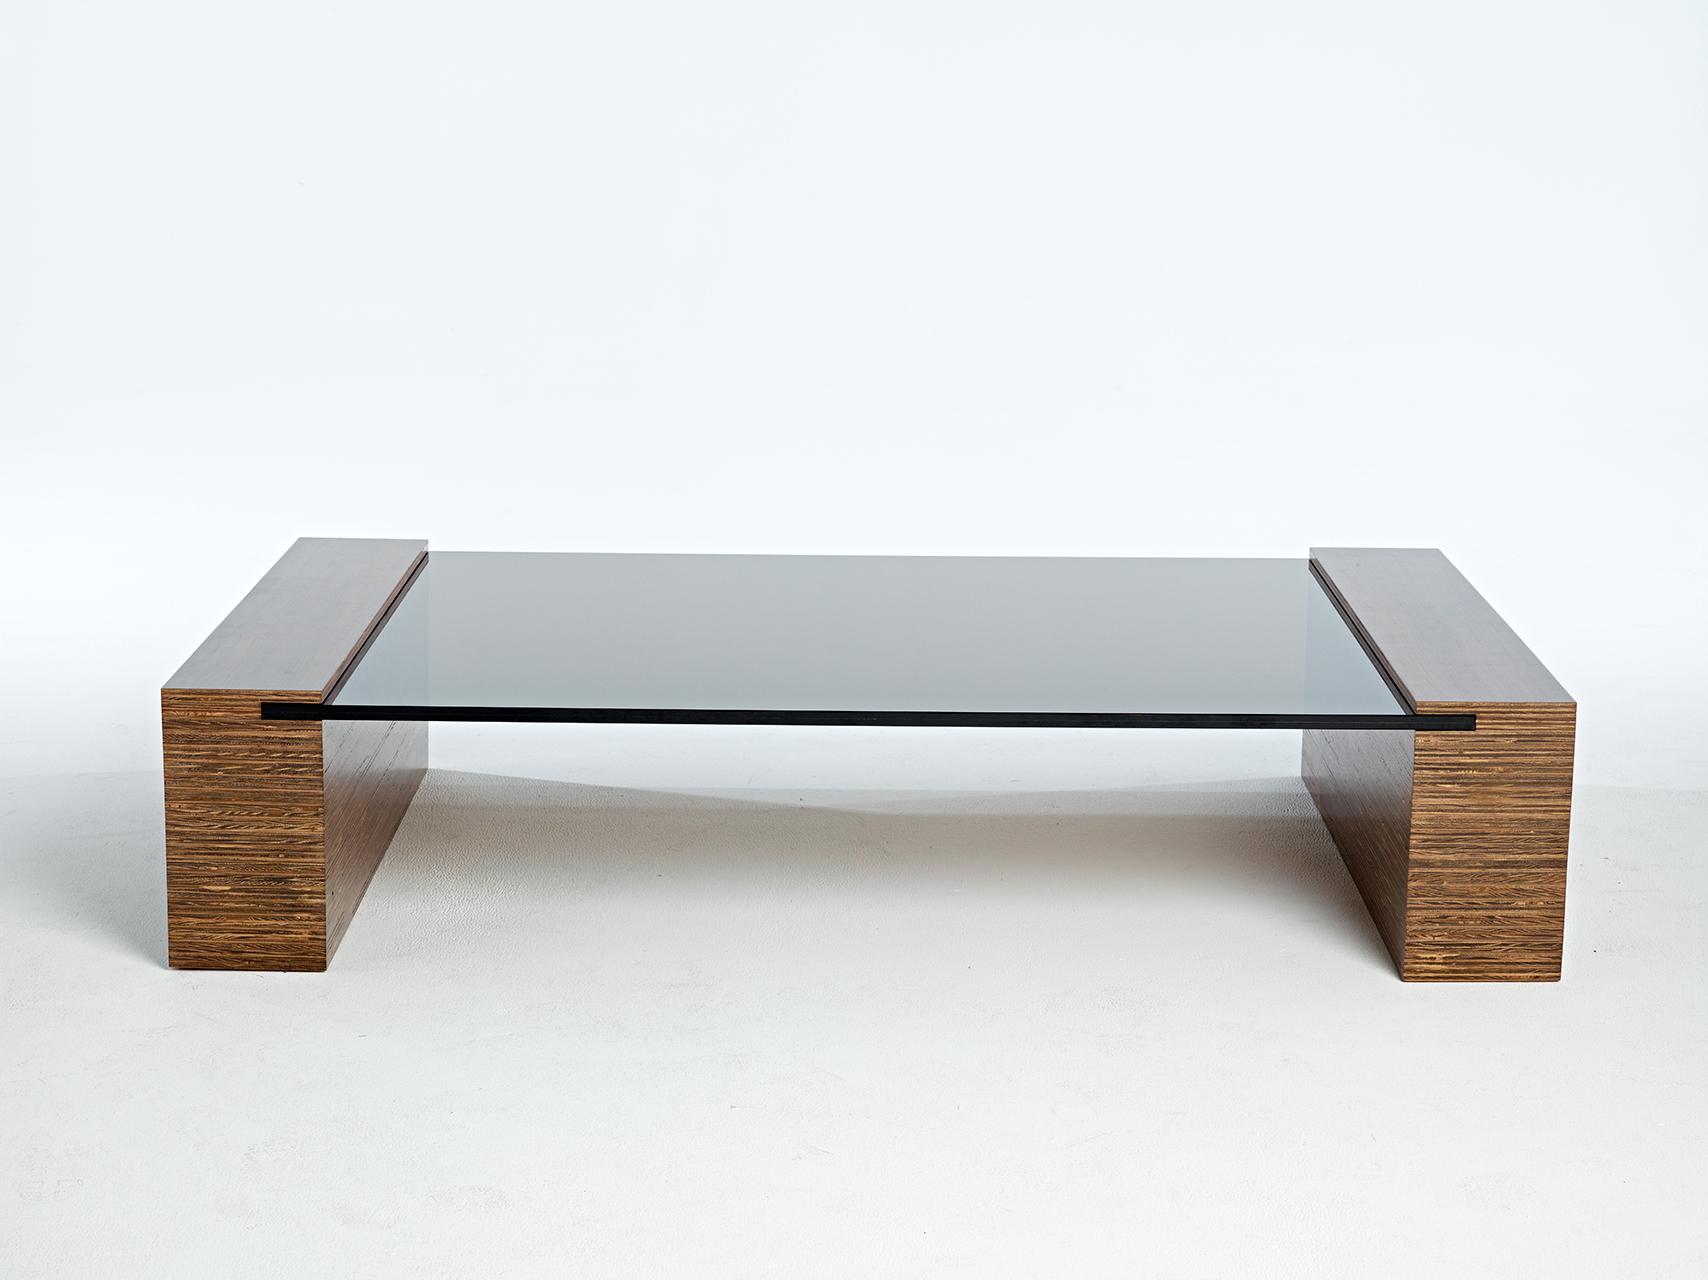 Scot Sardinha and Modern Earth Home's Pure Table.